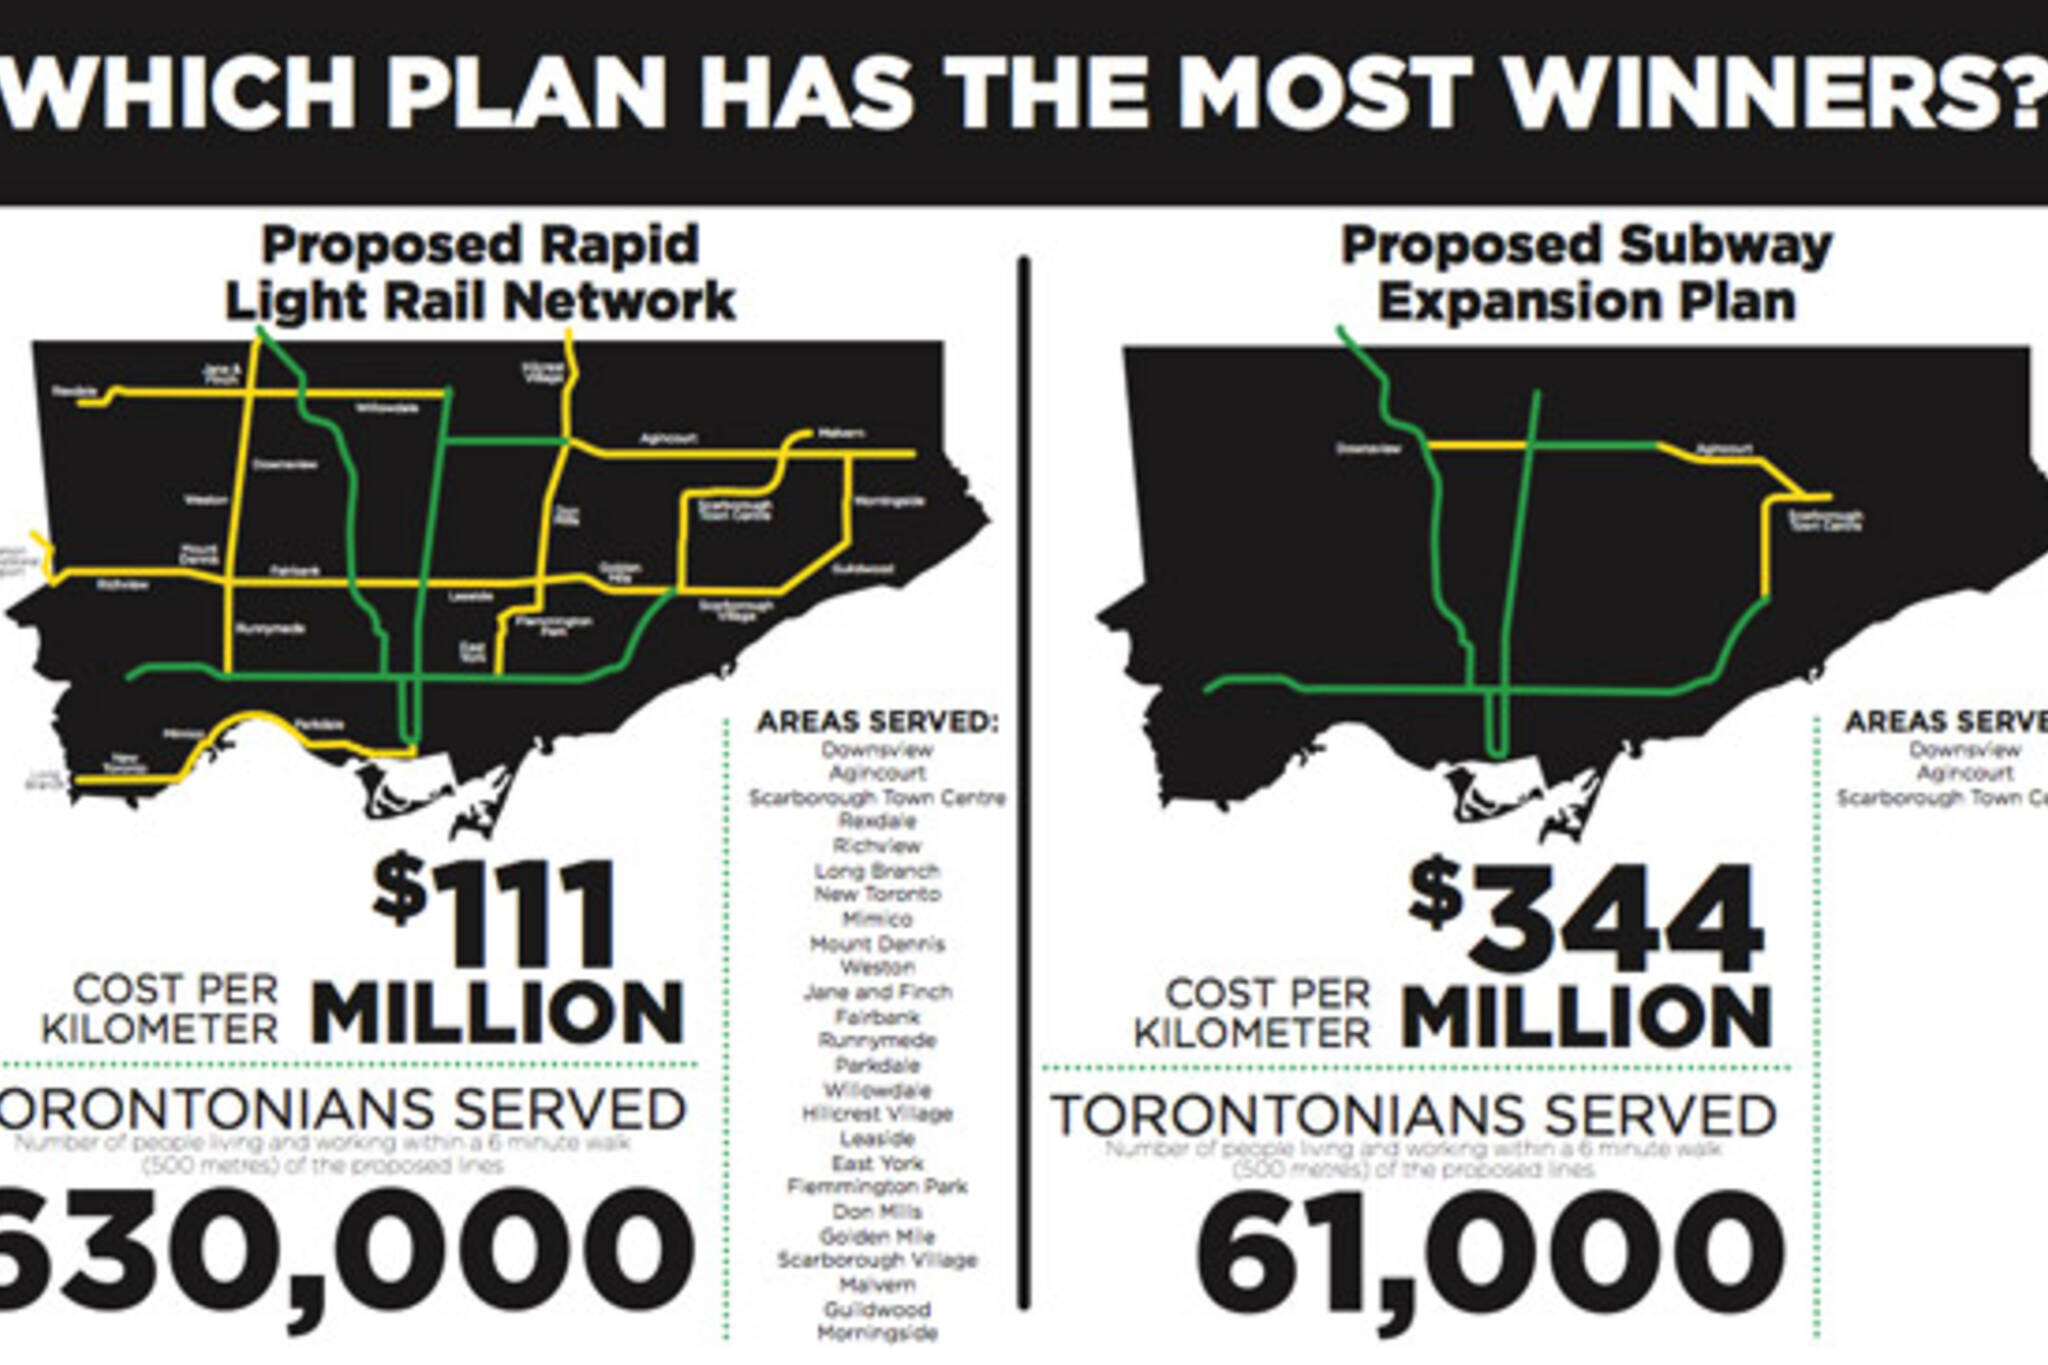 Transit City vs. Ford subway